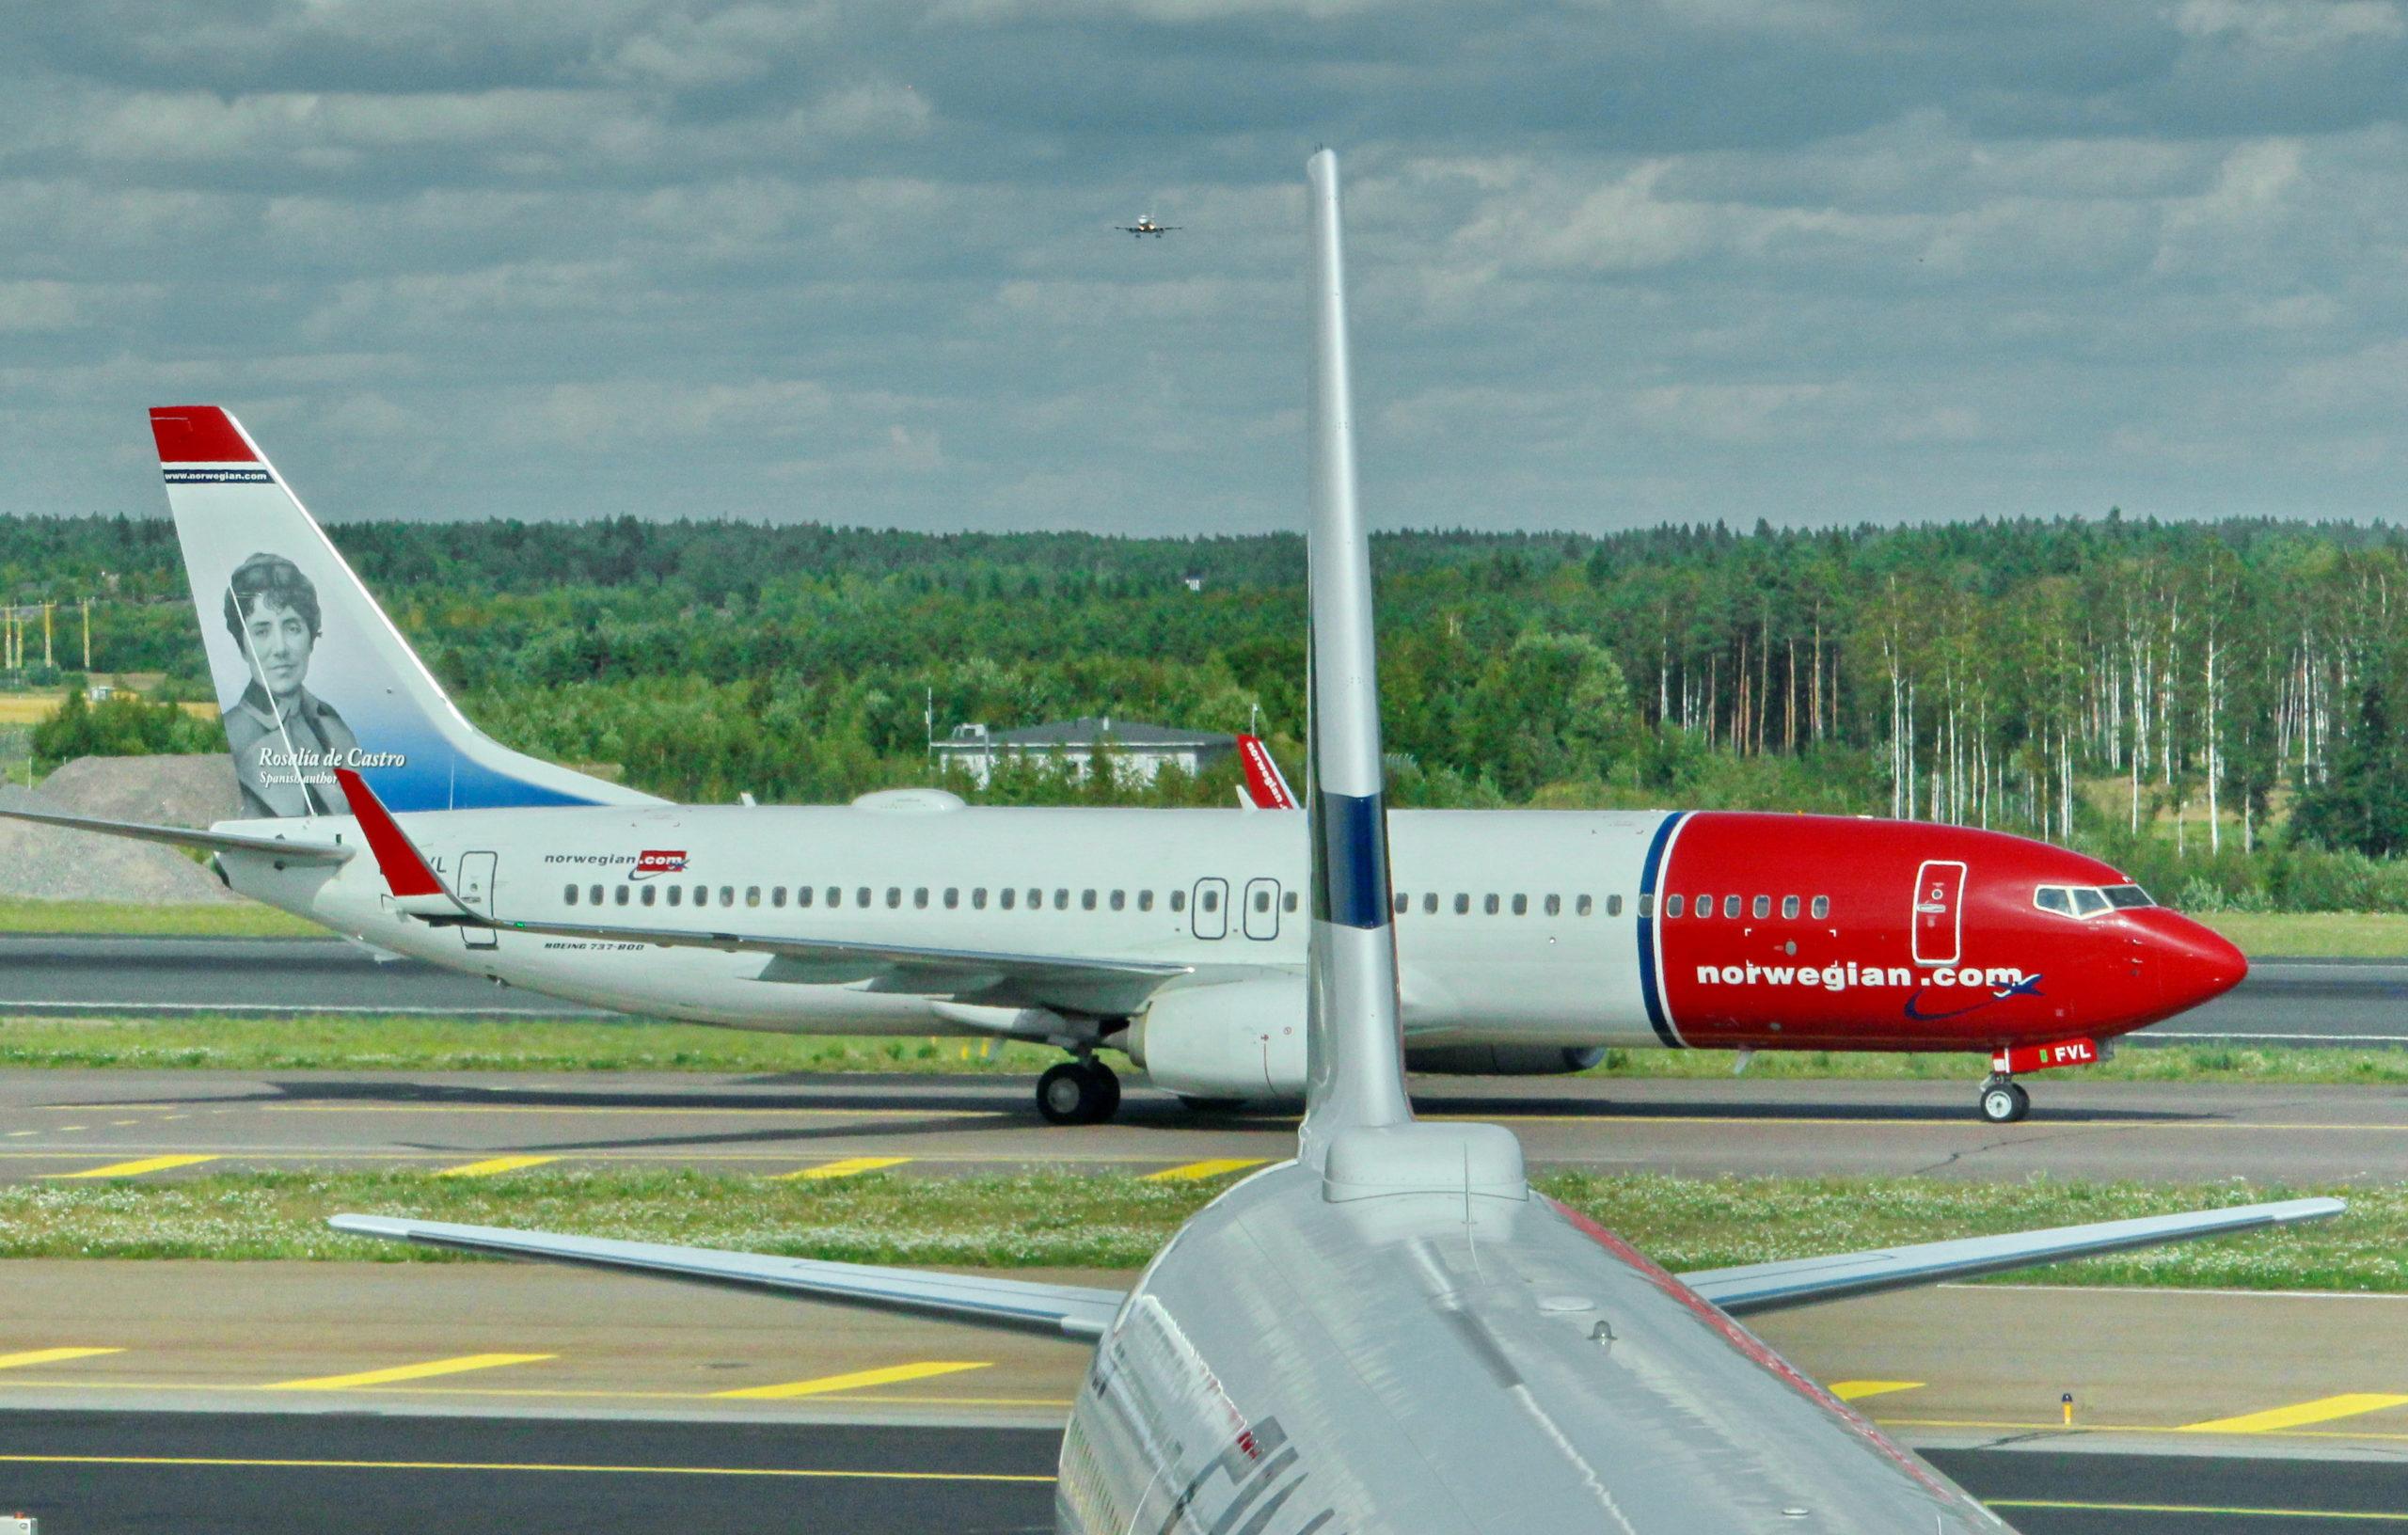 Norwegian-scaled.jpg